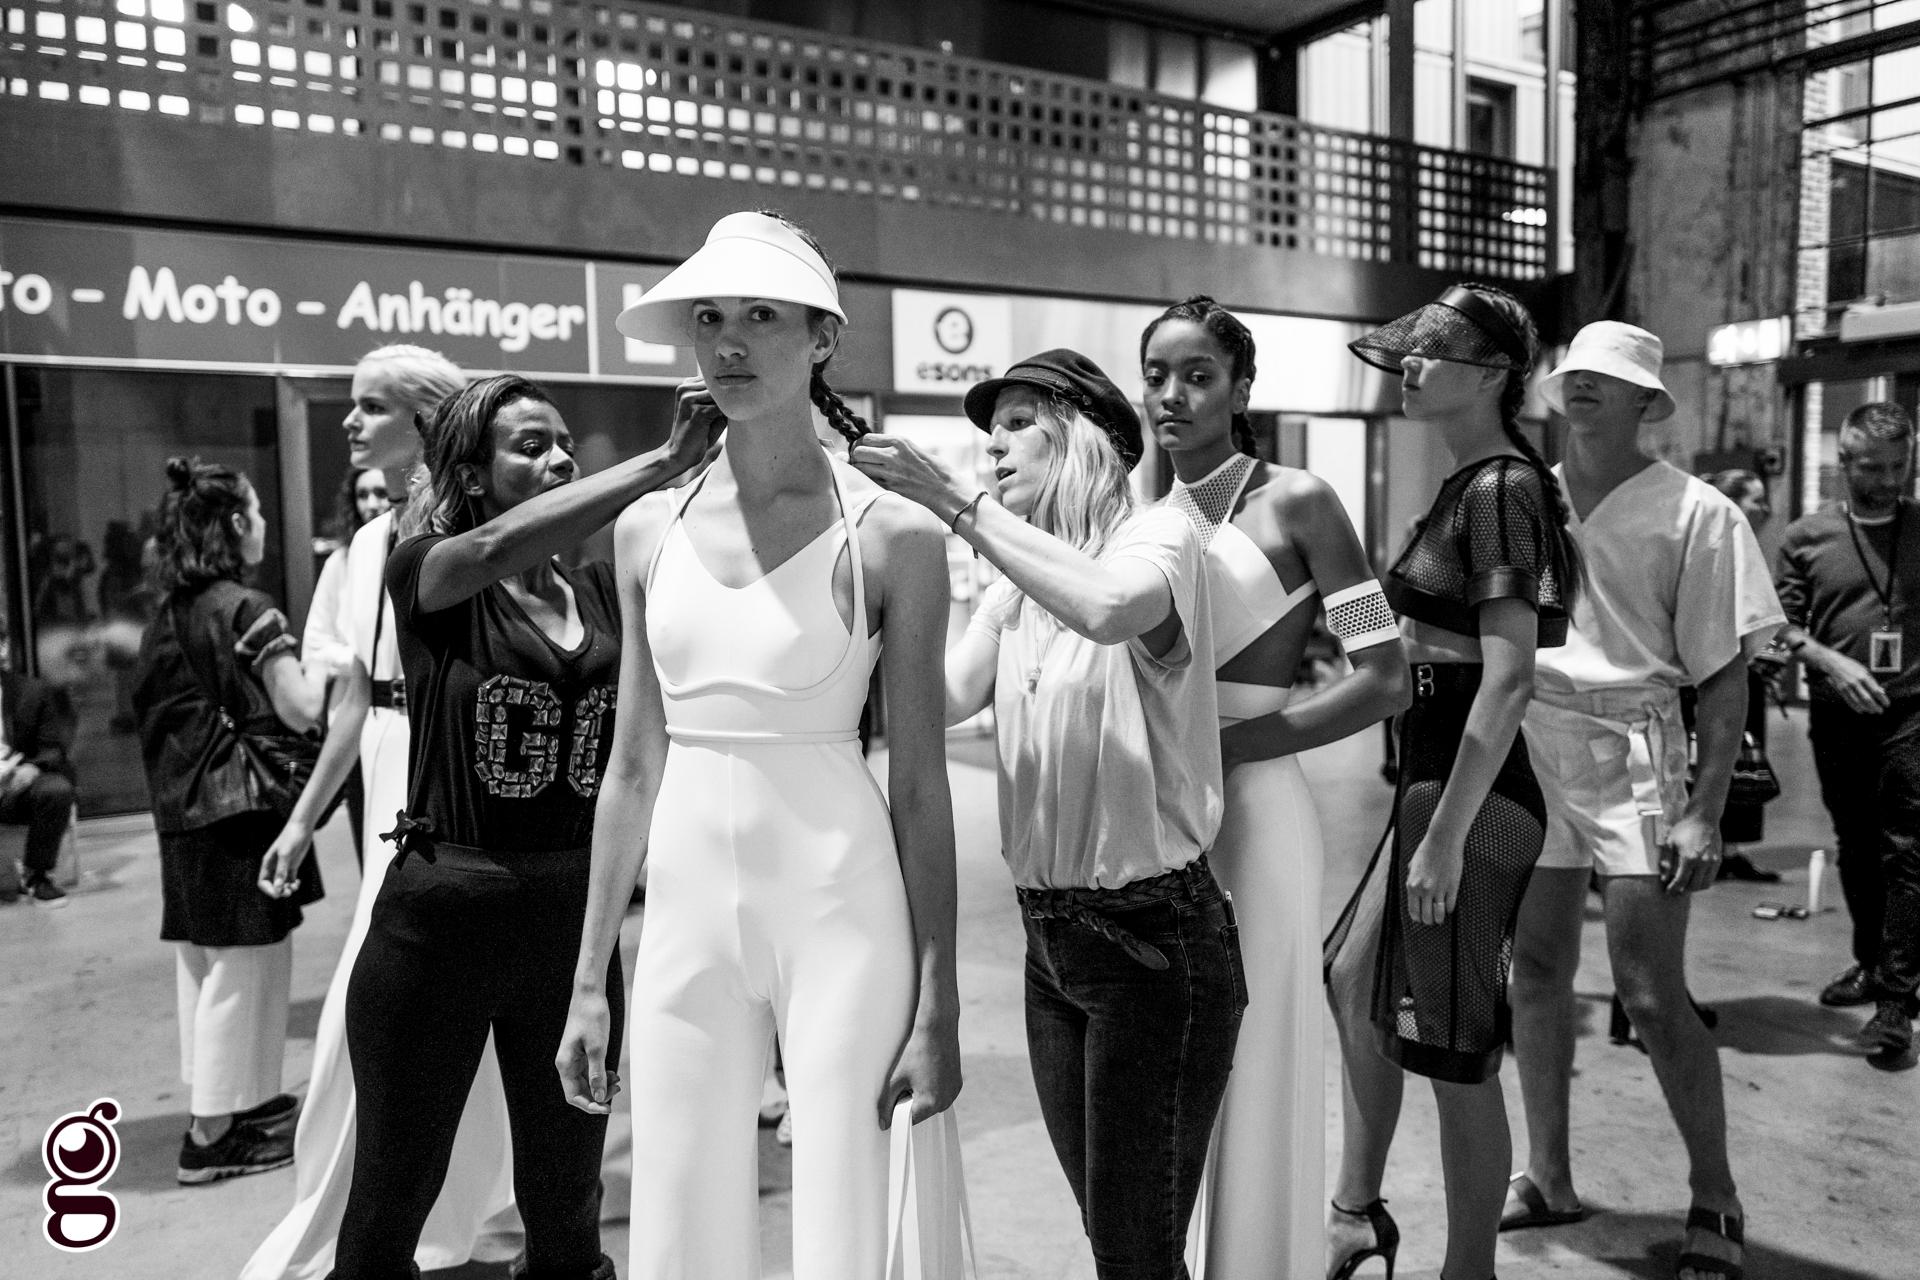 fashion, mode, mode suisse 10, zürich, models, catwalk, behind the scenes, backstage, reportage